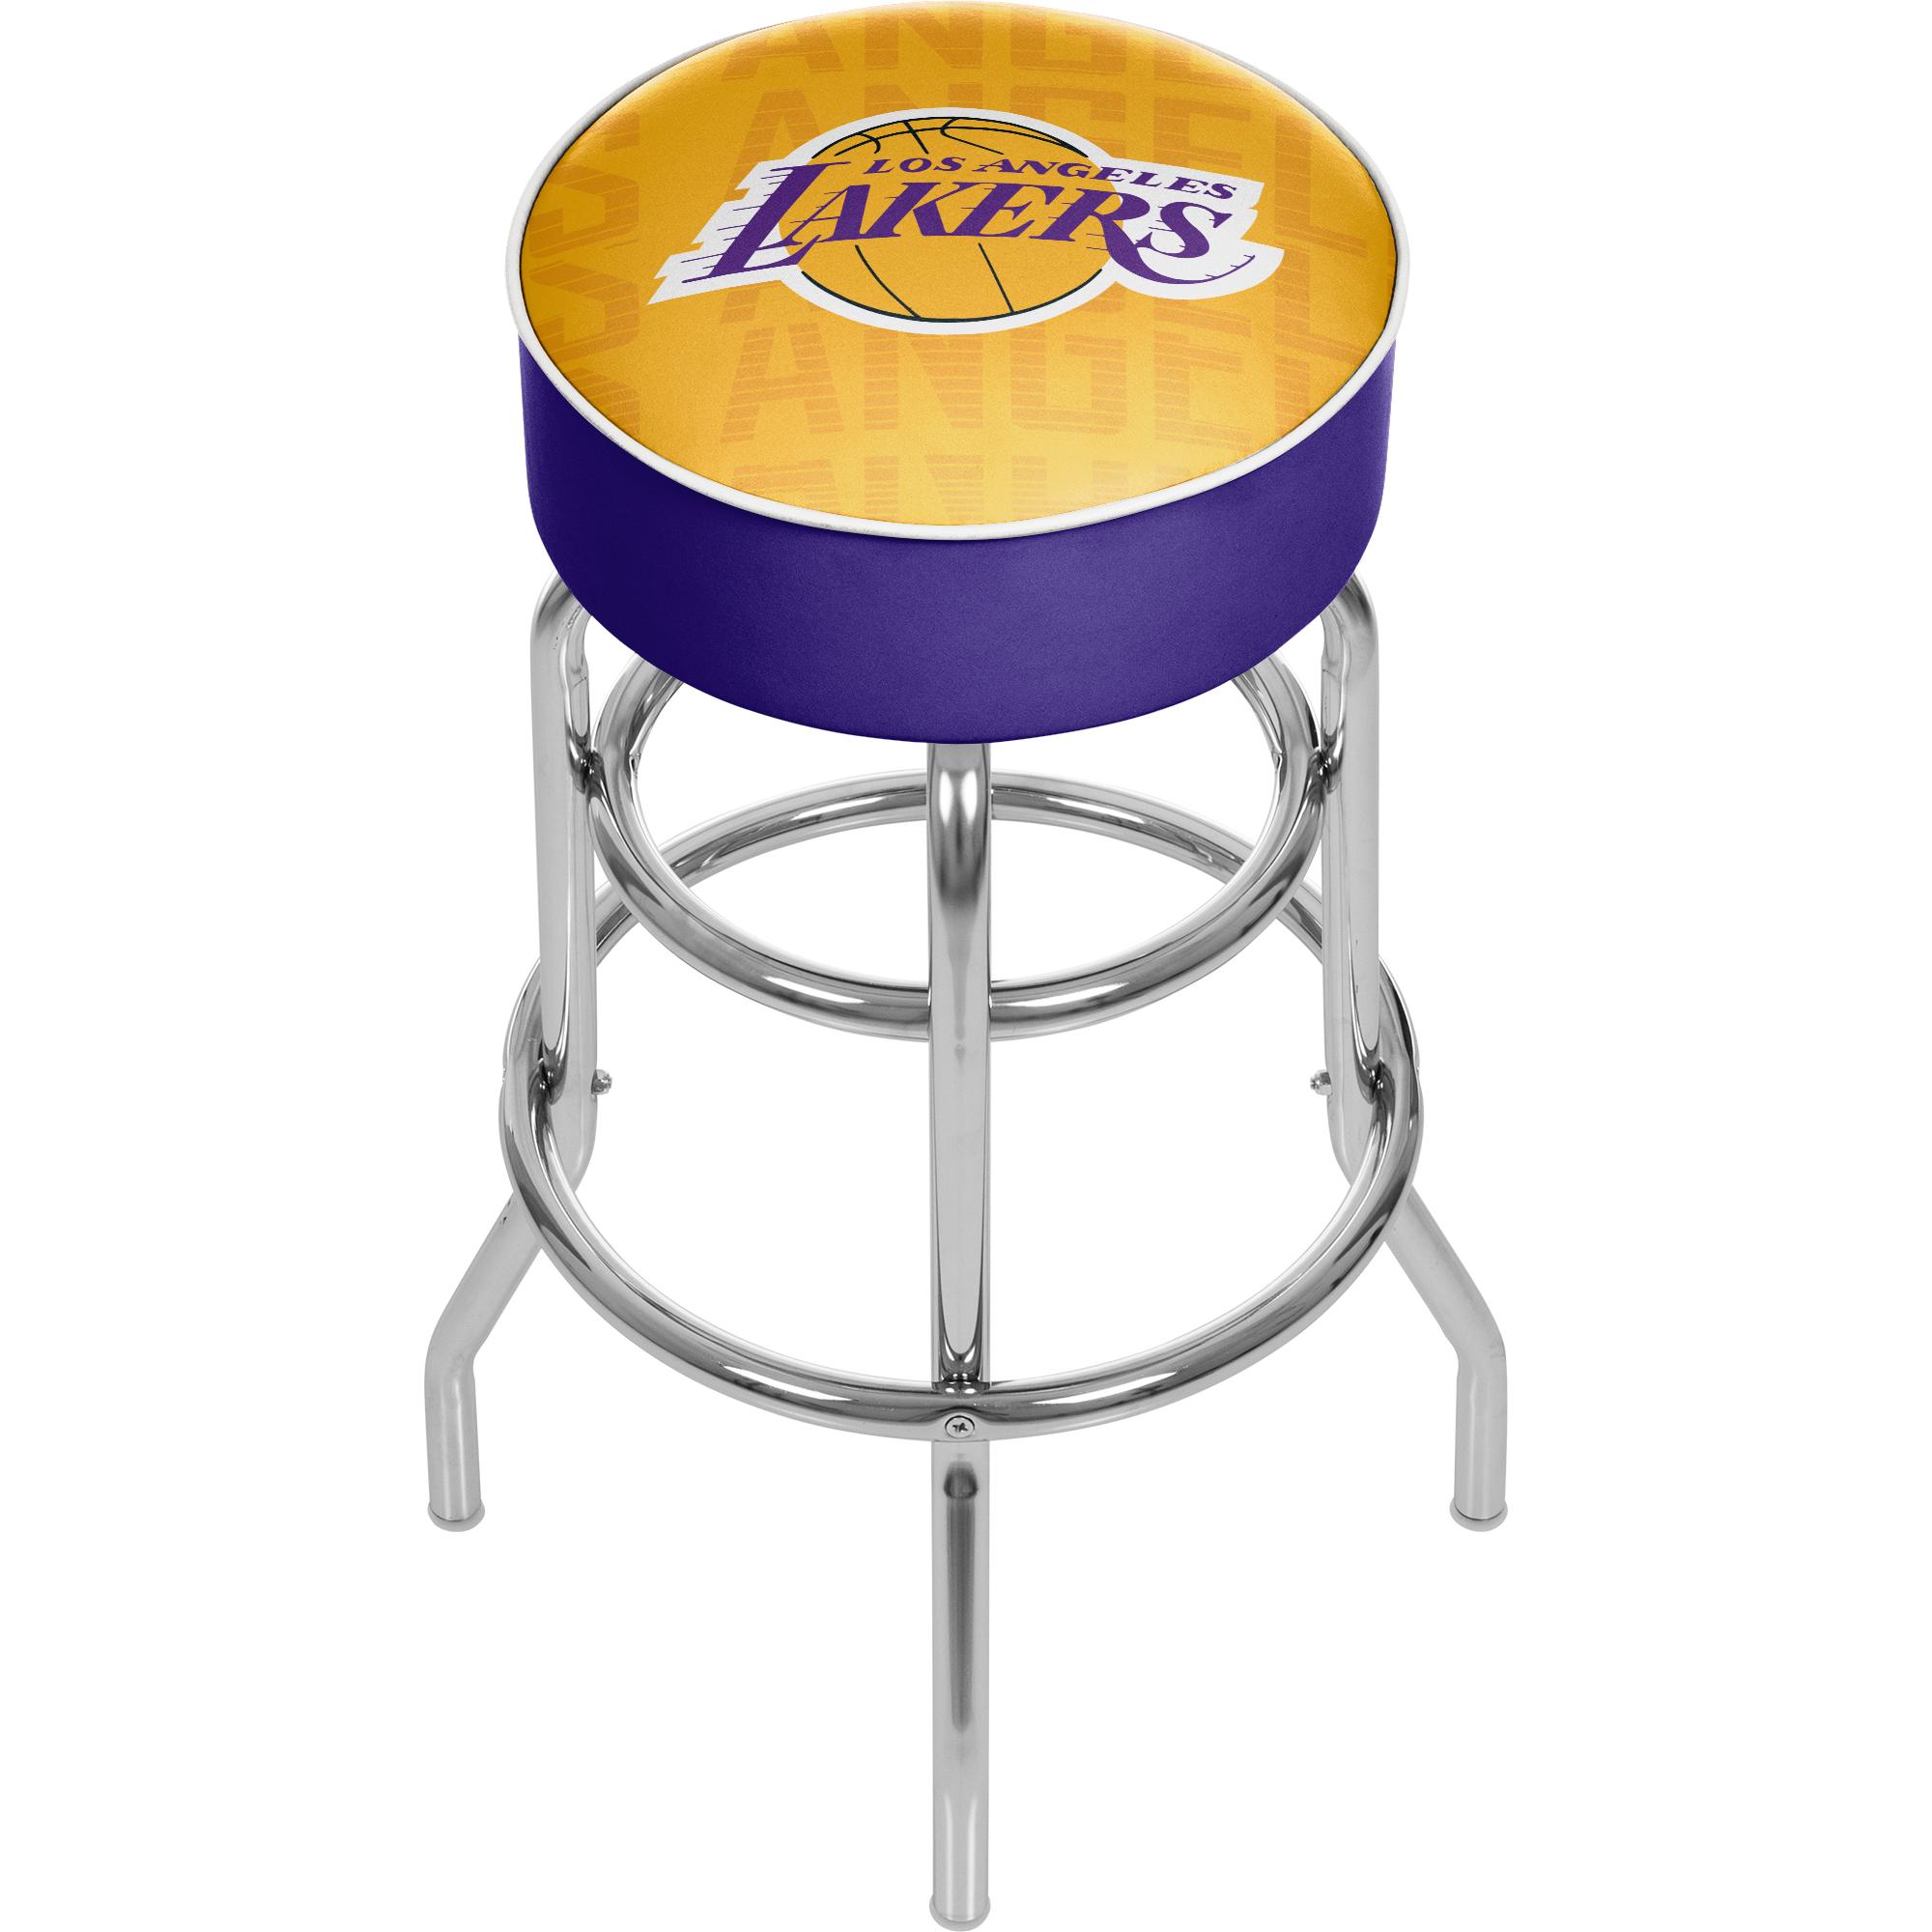 NBA Padded Swivel Bar Stool - City - Los Angeles Lakers